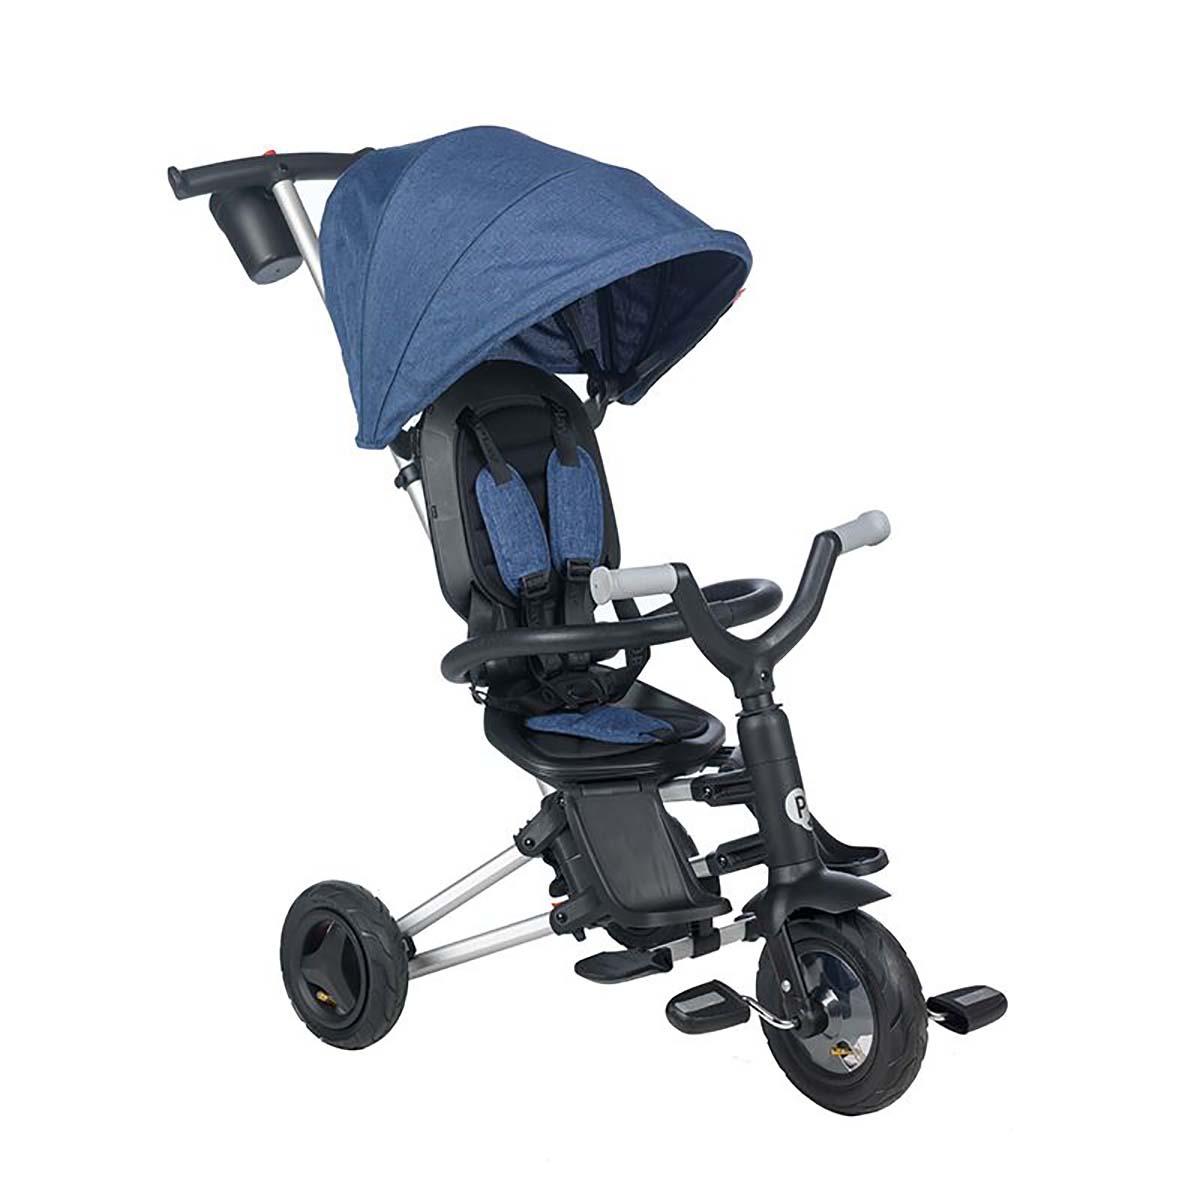 Tricicleta ultrapliabila Qplay Nova, Albastru